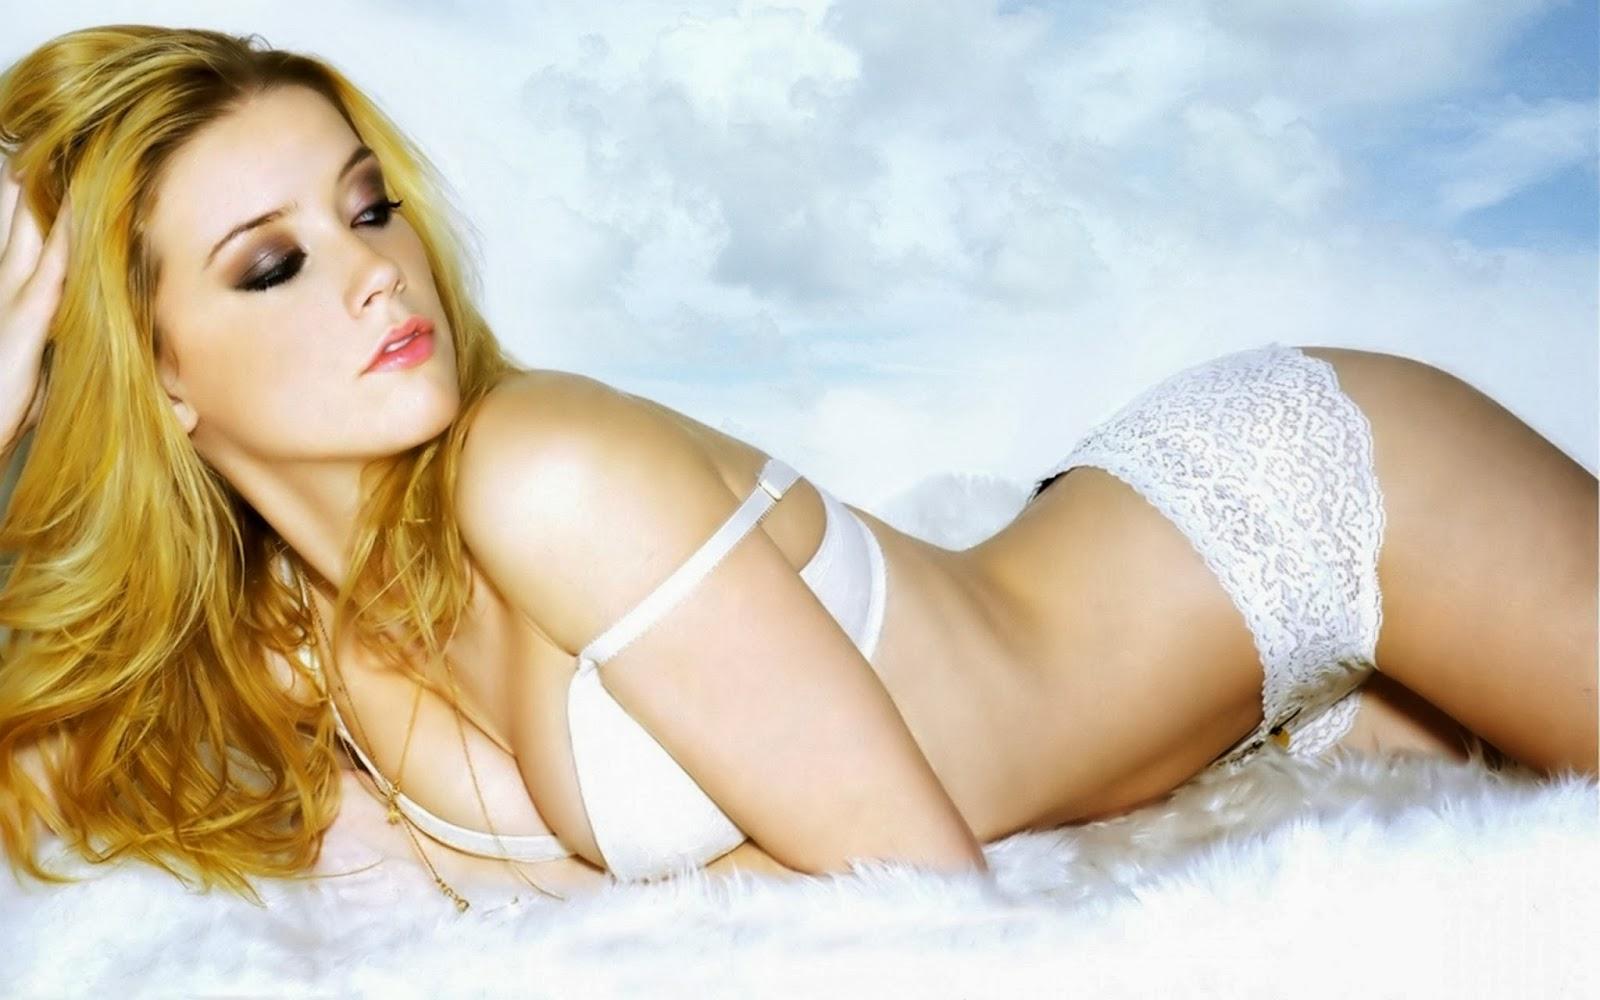 Amanda righetti nude sex in angel blade scandalplanetcom 10